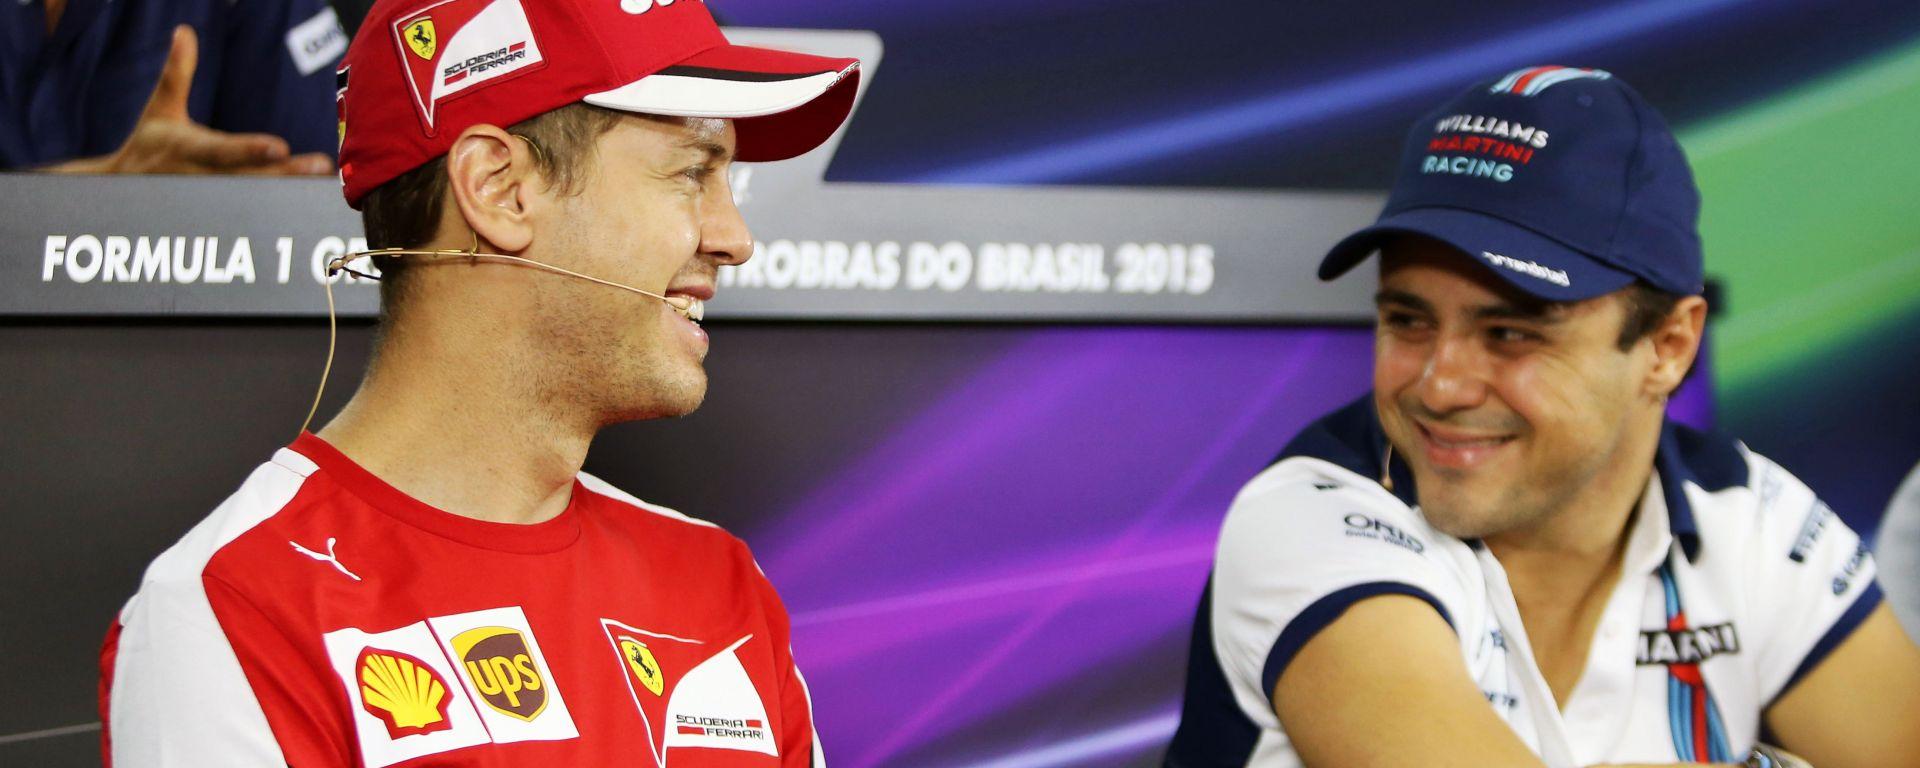 F1 2015: Sebastian Vettel (Ferrari) e Felipe Massa (Williams)